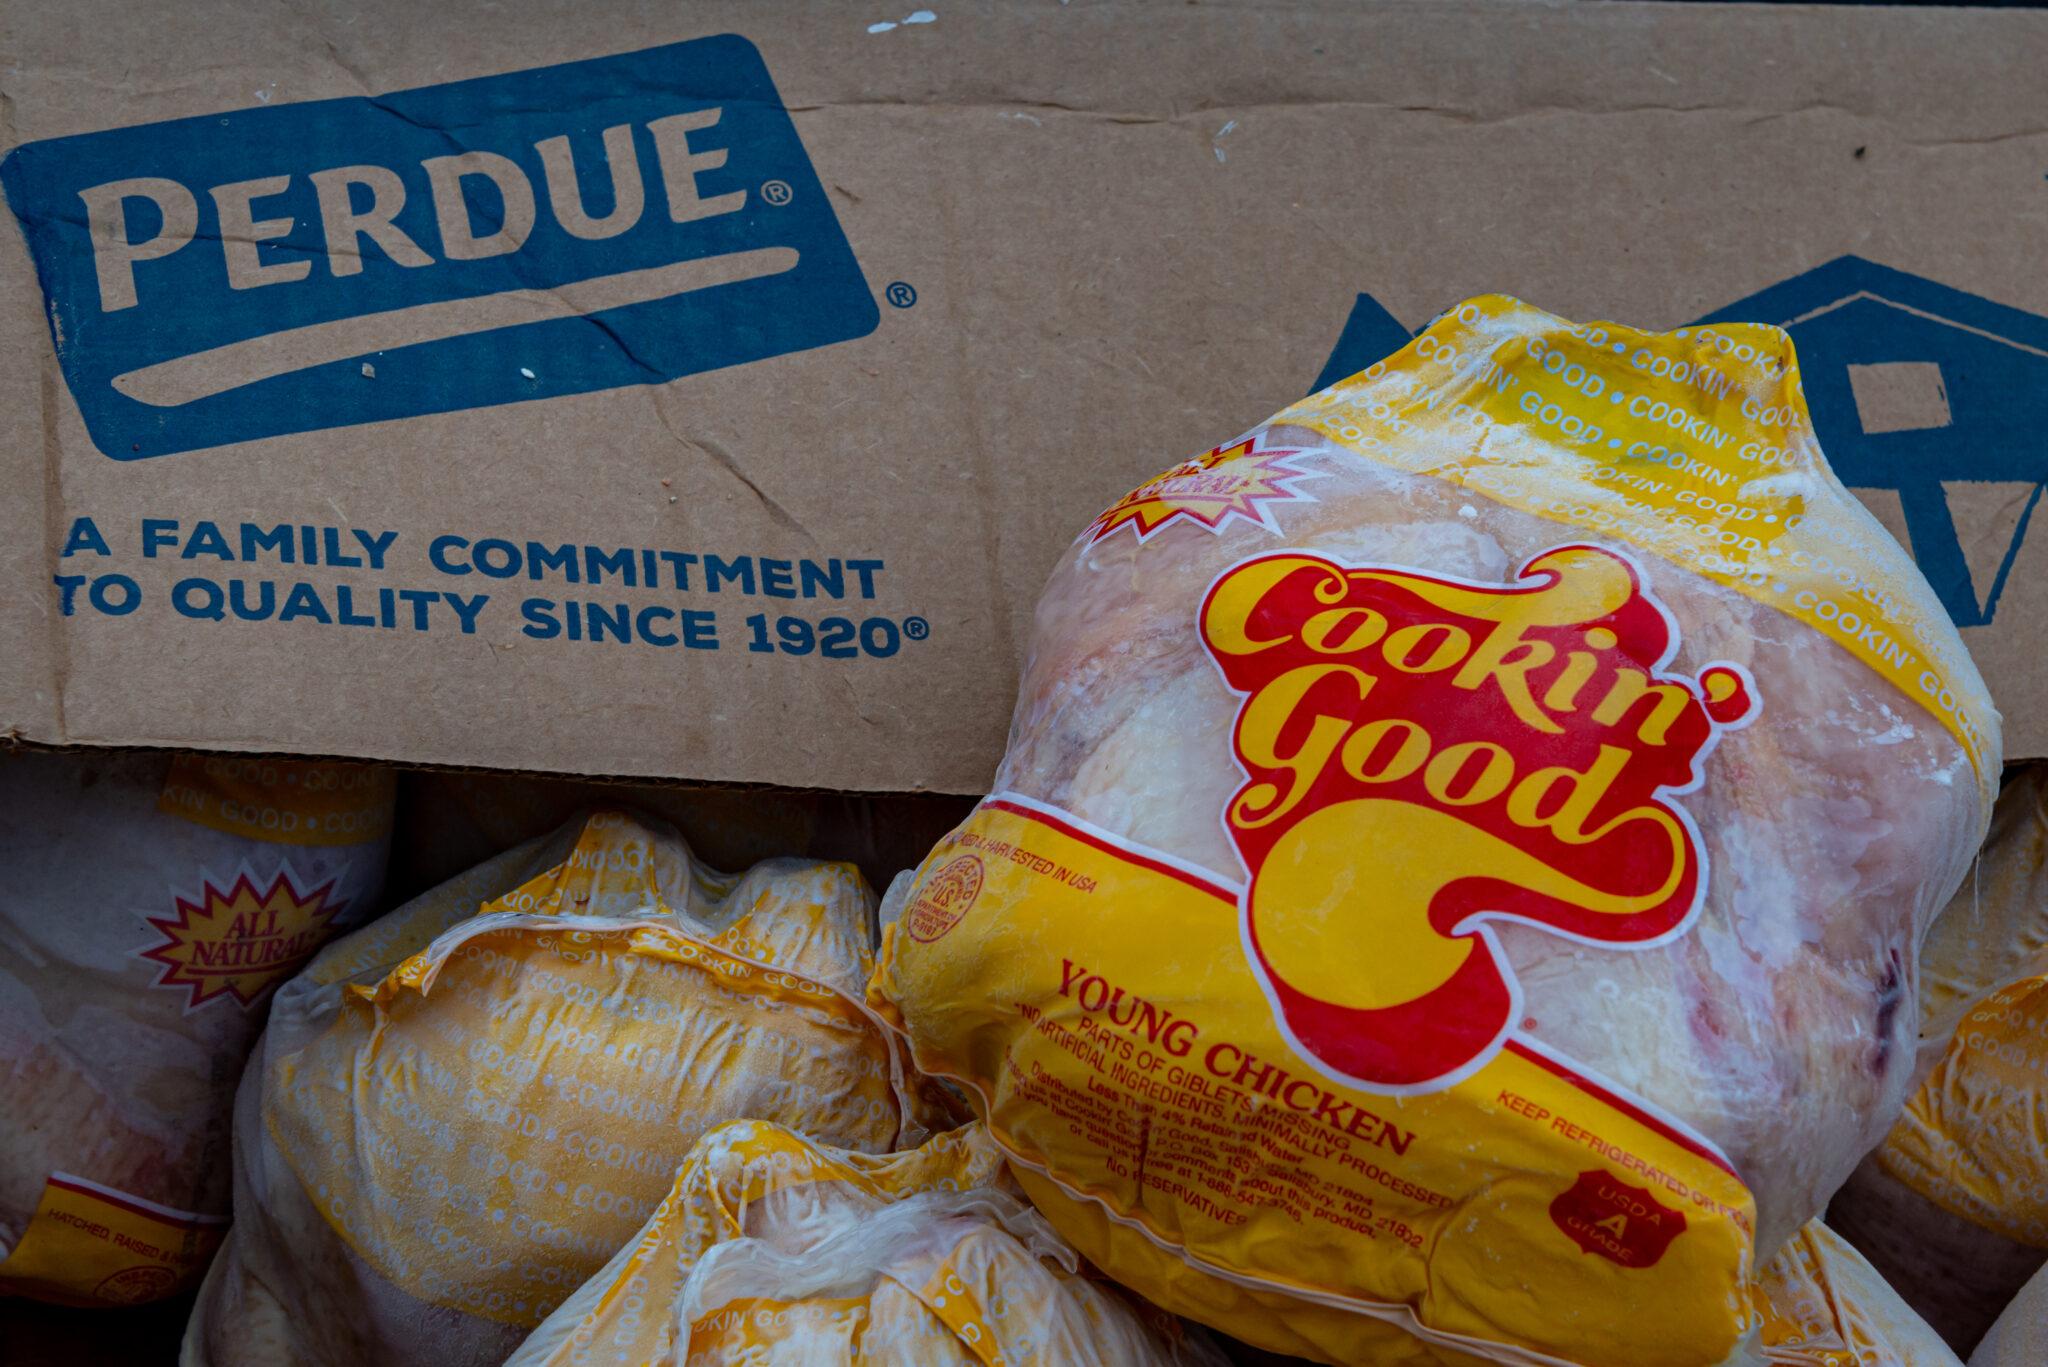 Perdue holiday roaster distribution